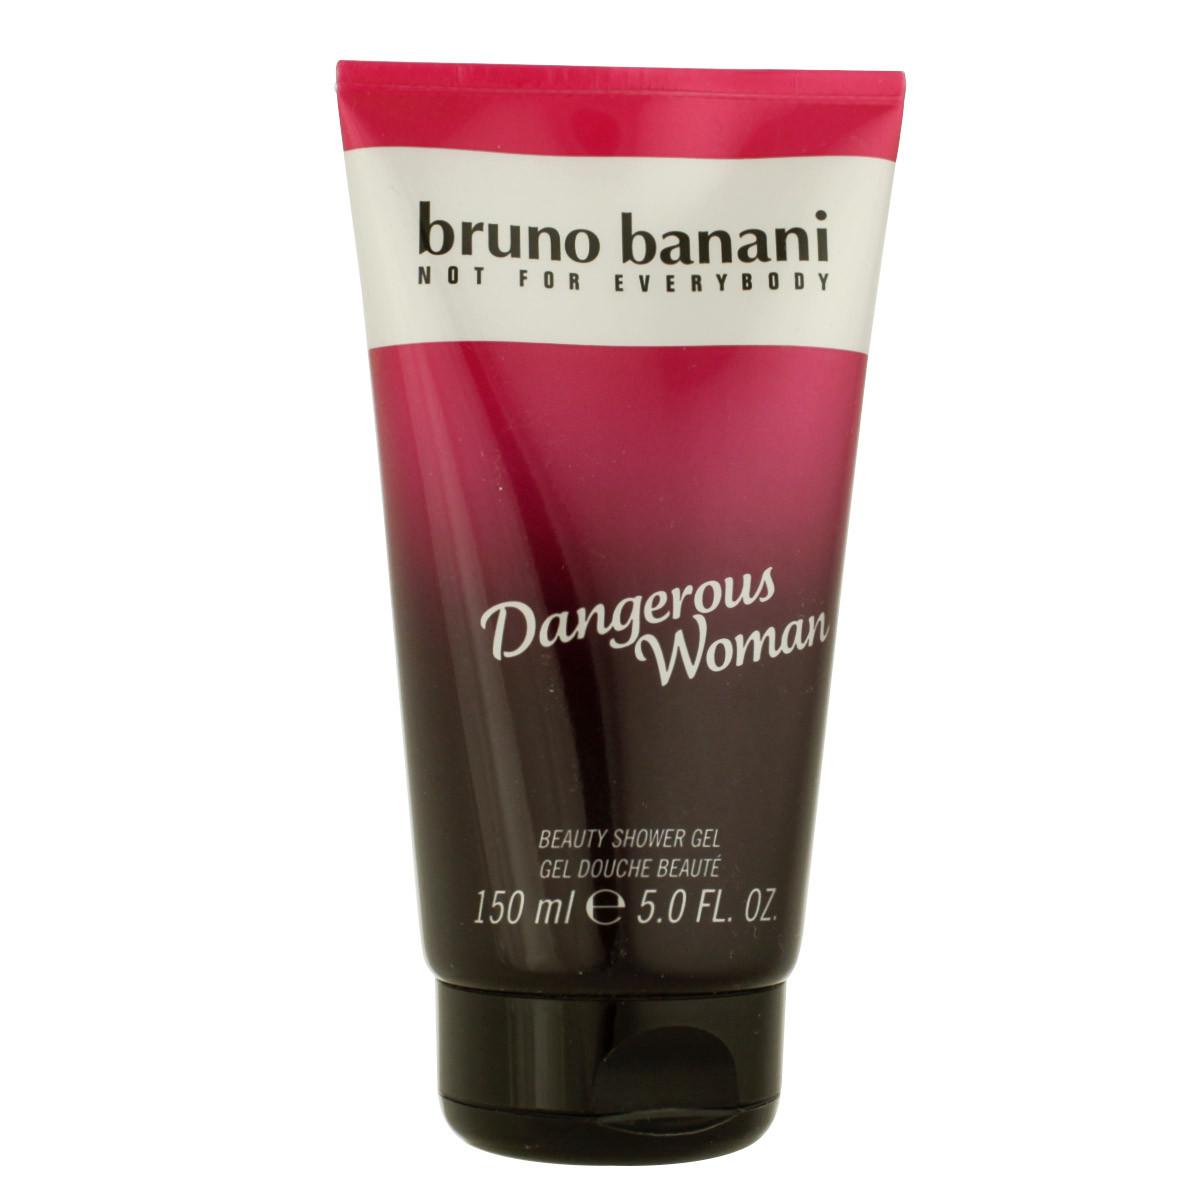 bruno banani dangerous woman duschgel 150 ml woman. Black Bedroom Furniture Sets. Home Design Ideas